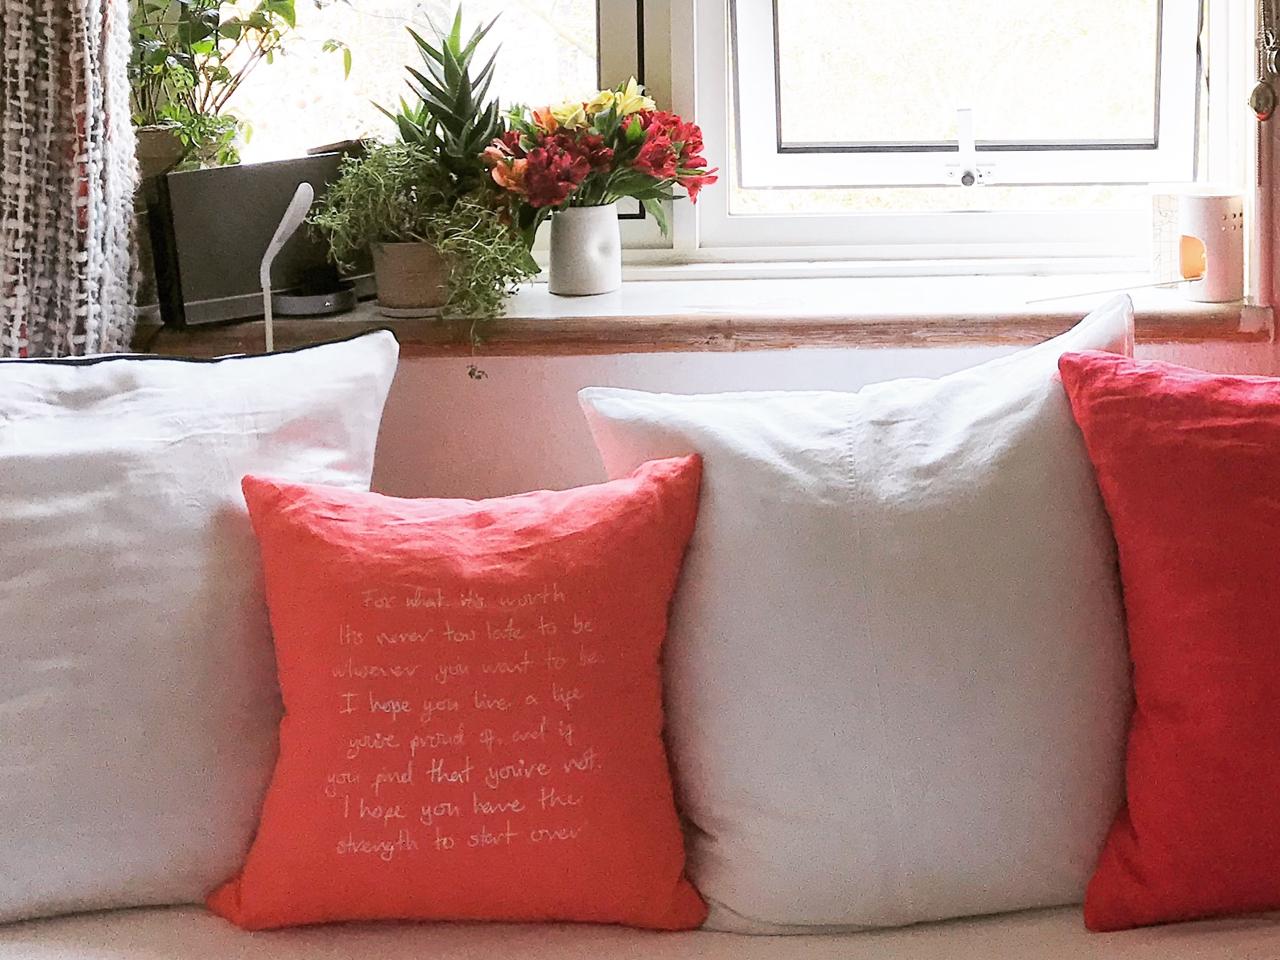 bea+decorative+pillow+by+csevenm.jpg